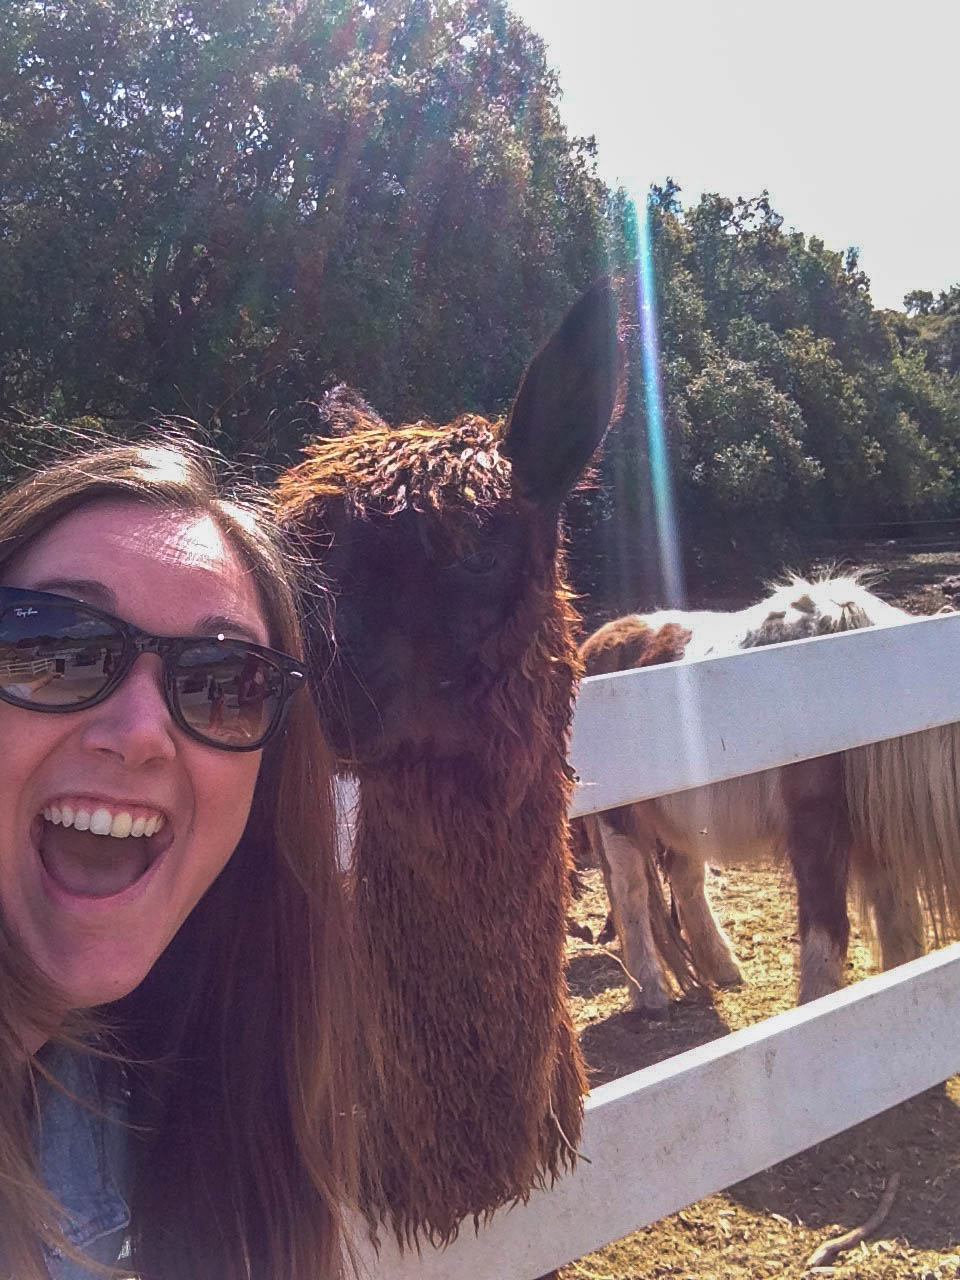 Malibu Wine Safari - Feeding the Llamas and Alpacas